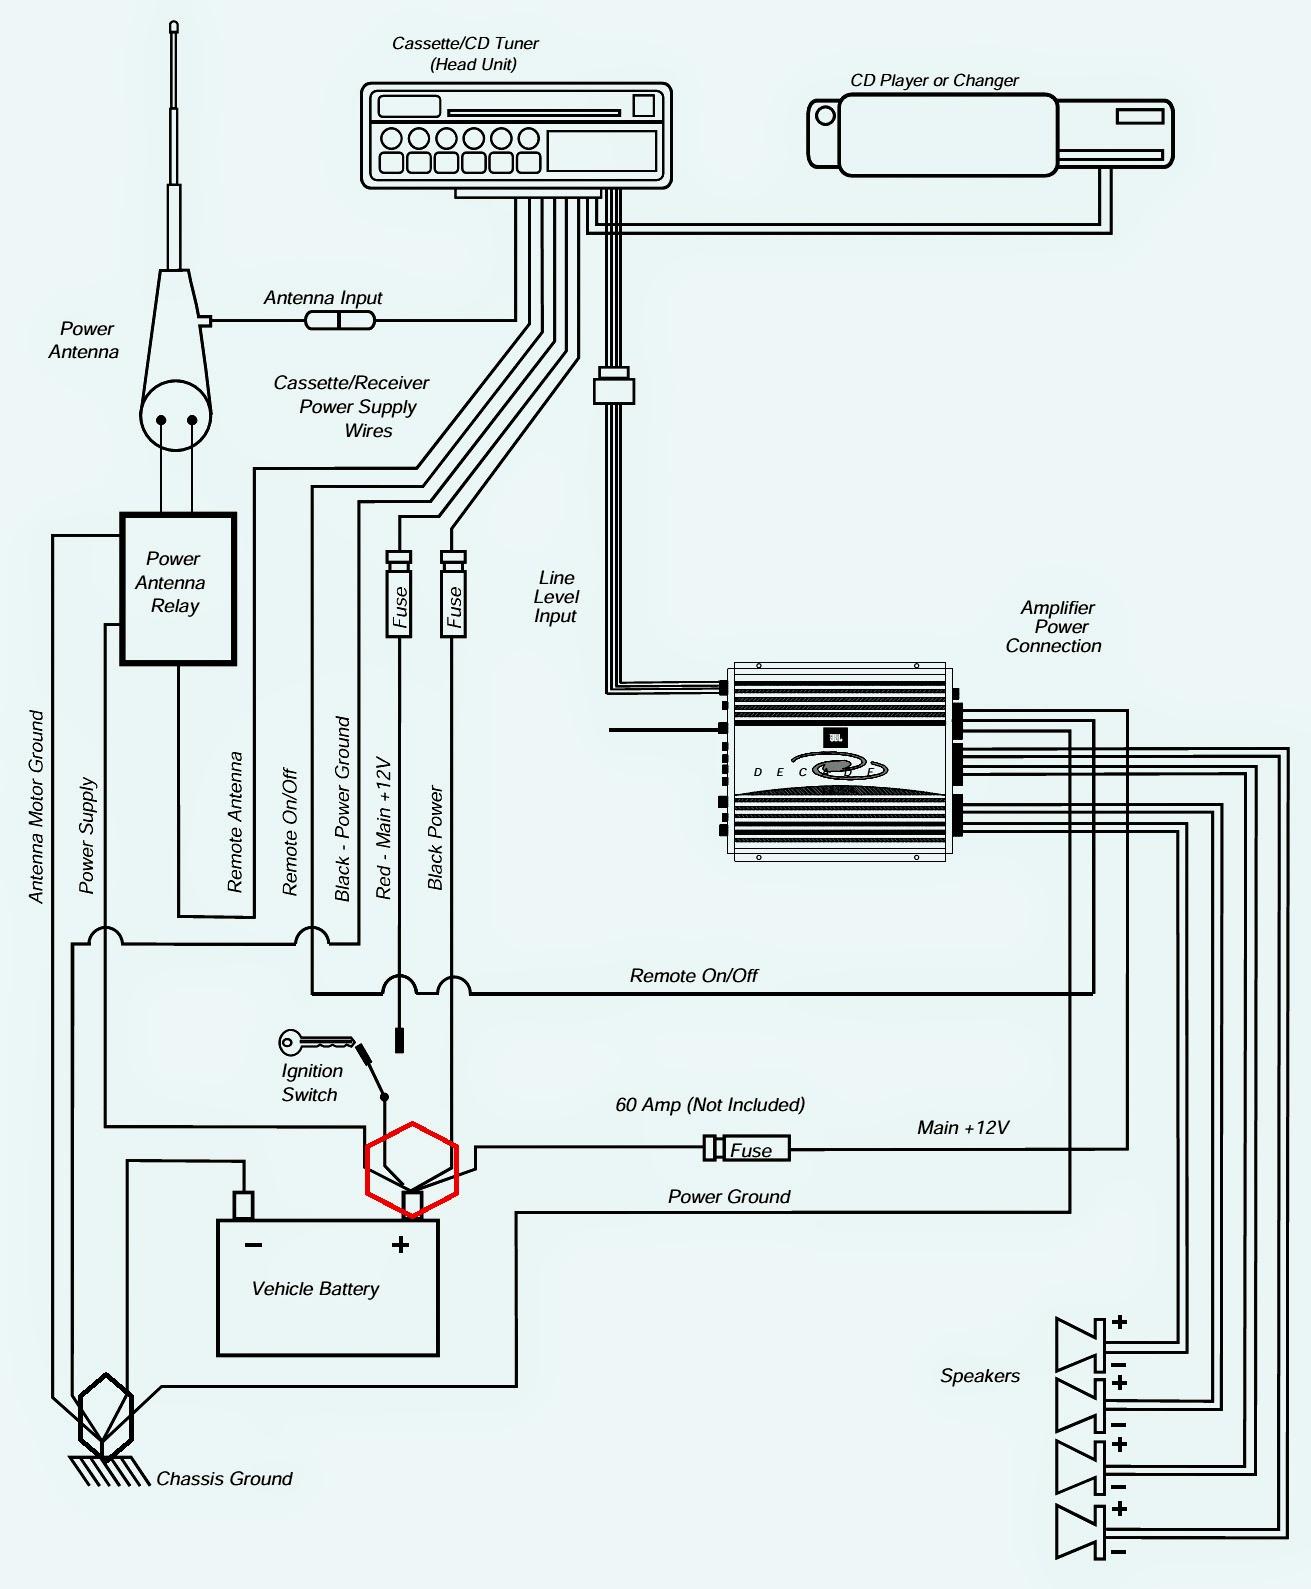 rf_7519] jbl da3504 wiring diagram amplifier schematic car audio amp wiring schematic how to wire high level input on amp phil phae mohammedshrine librar wiring 101